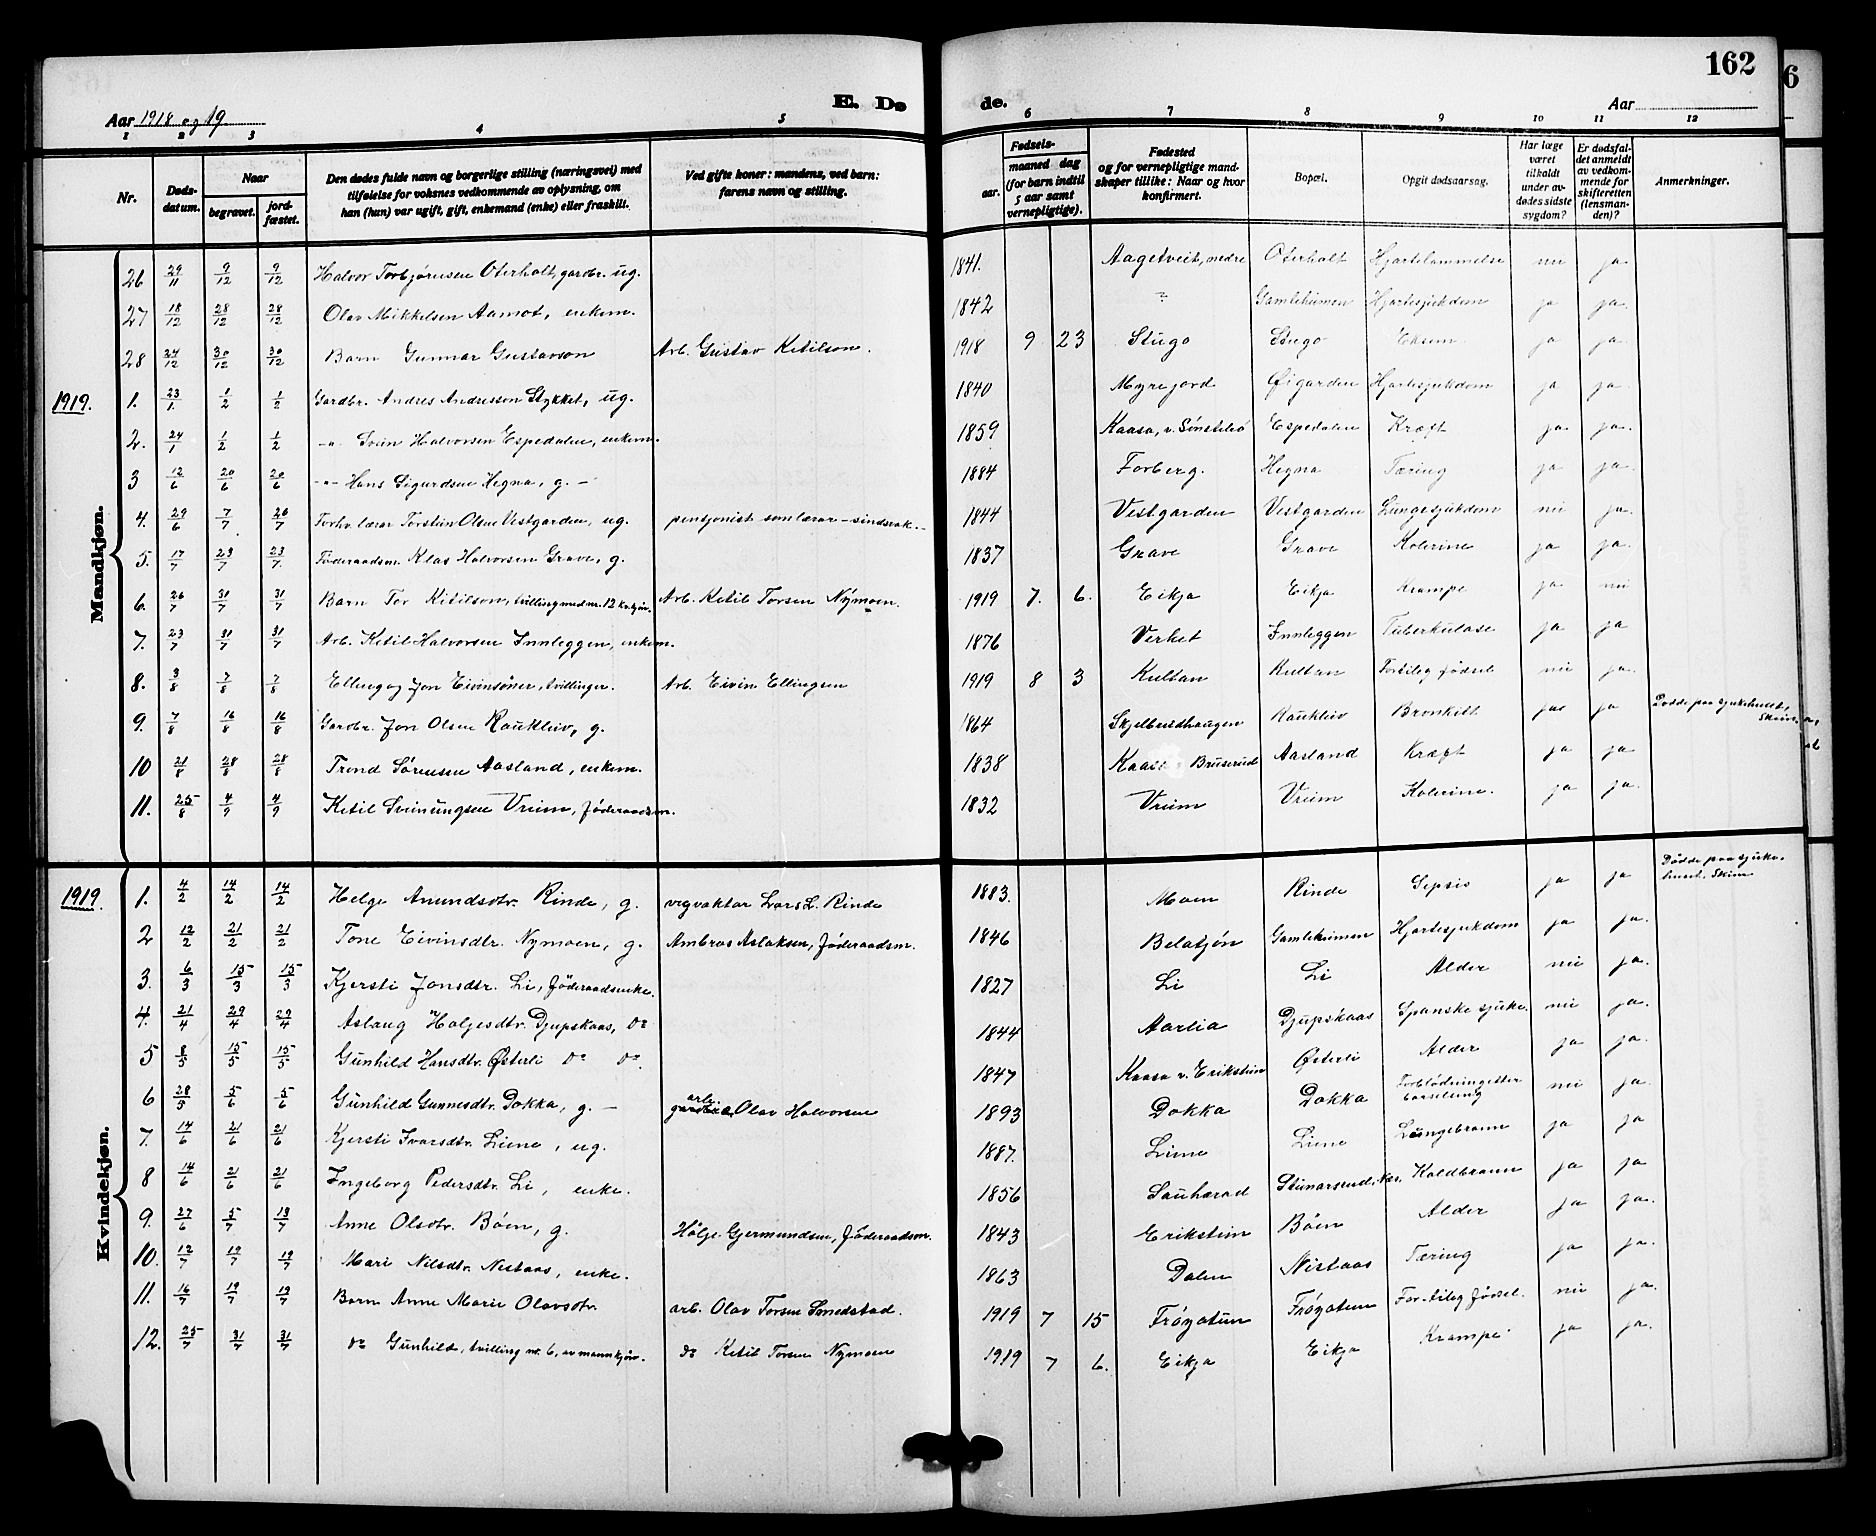 SAKO, Bø kirkebøker, G/Ga/L0007: Klokkerbok nr. 7, 1909-1924, s. 162